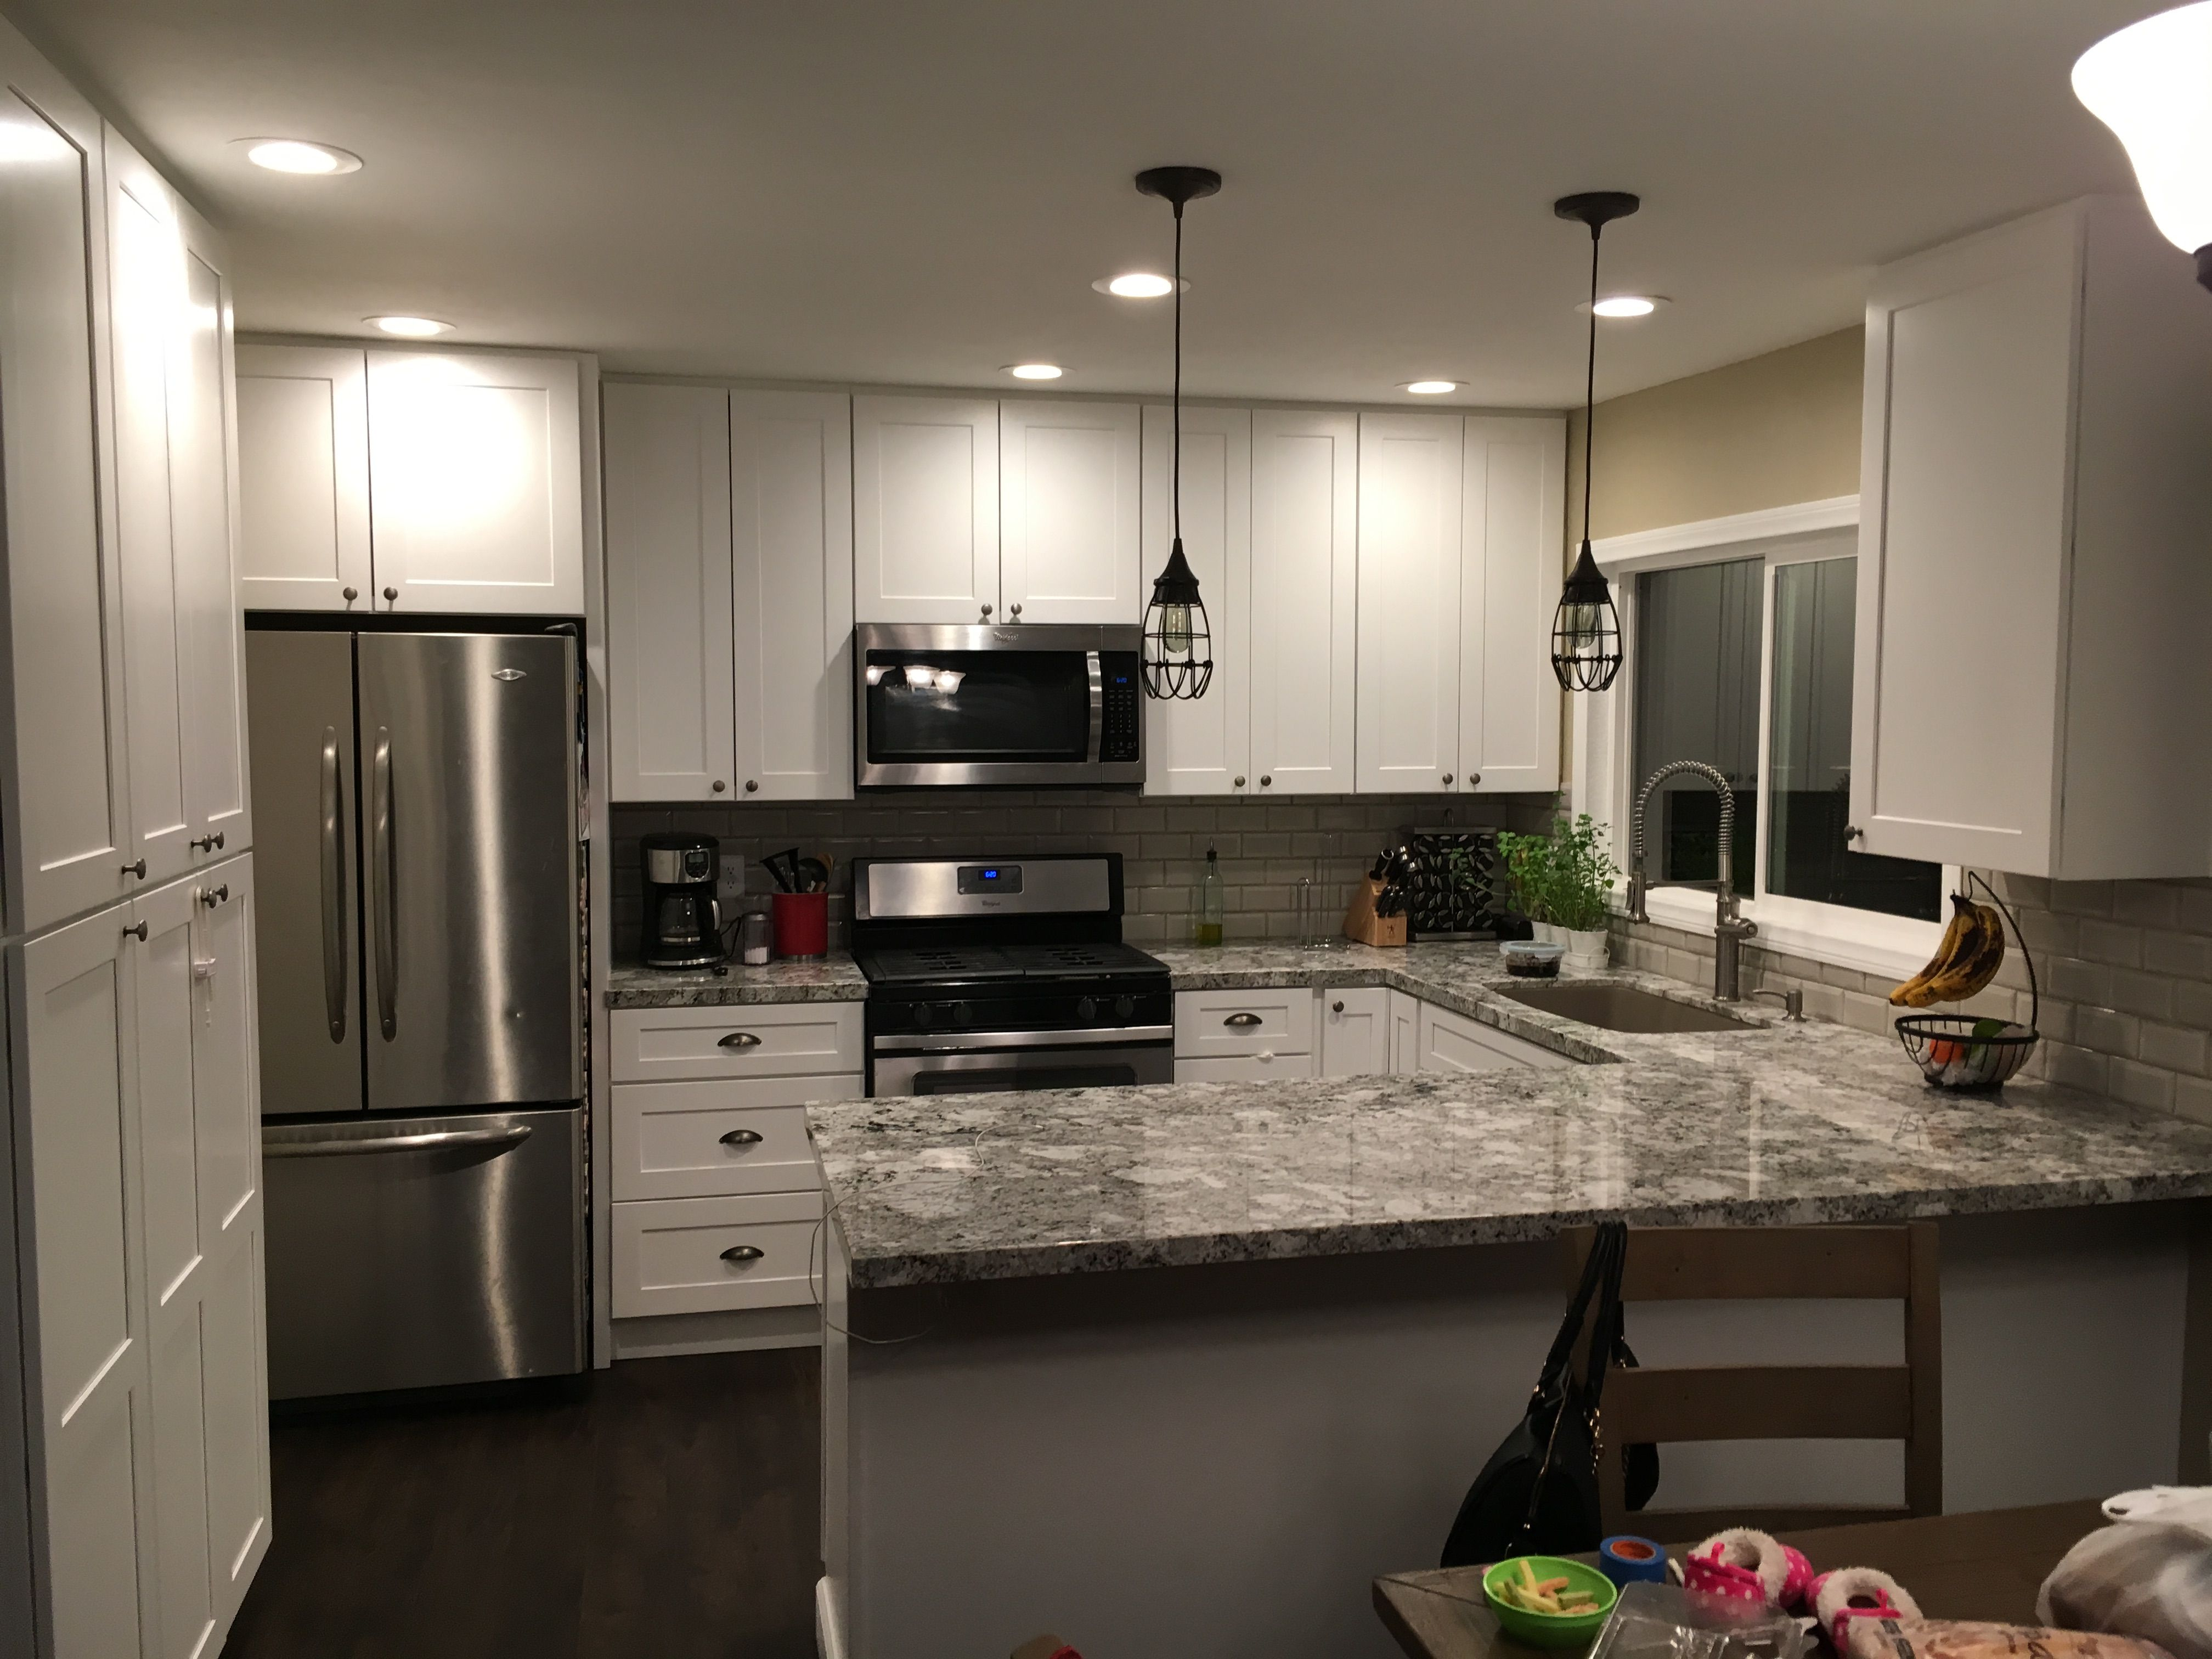 Kitchen Remodel Lennon Granite, White Shaker Cabinets, Subway Tile, Arizona  Tile, Blackstone